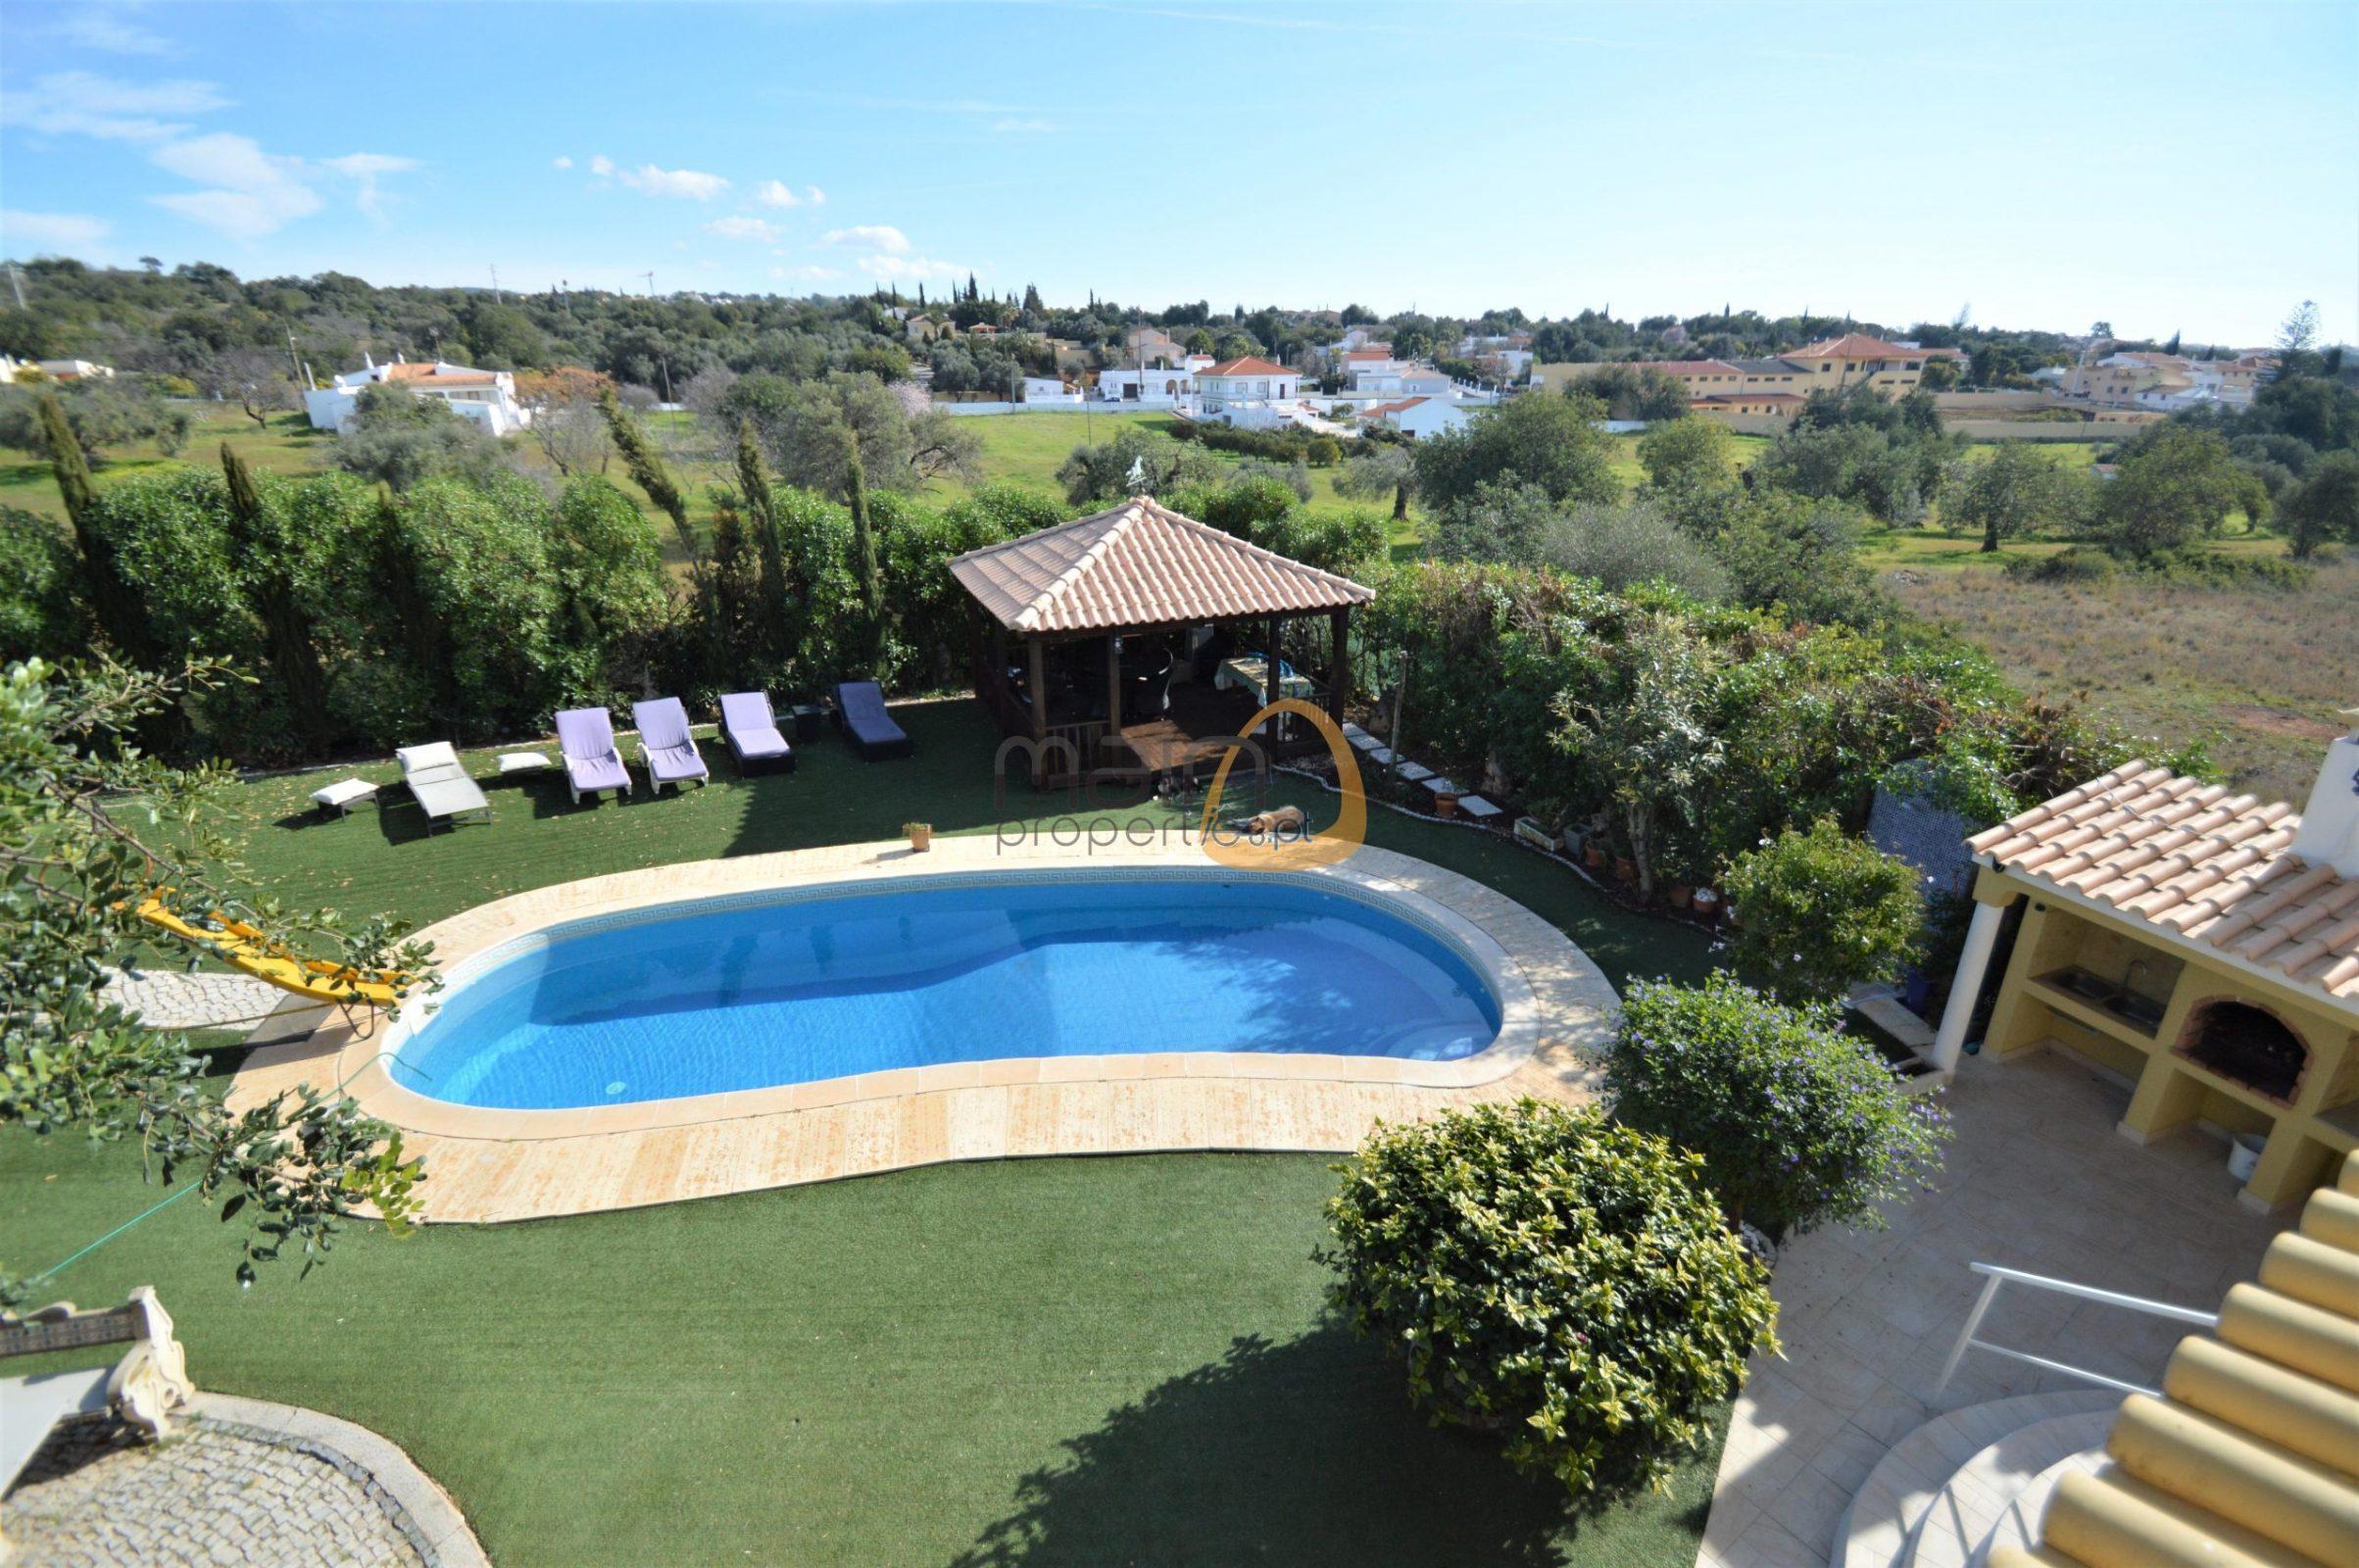 Villa with 6 bedrooms and private pool in Vale de Éguas, Almancil